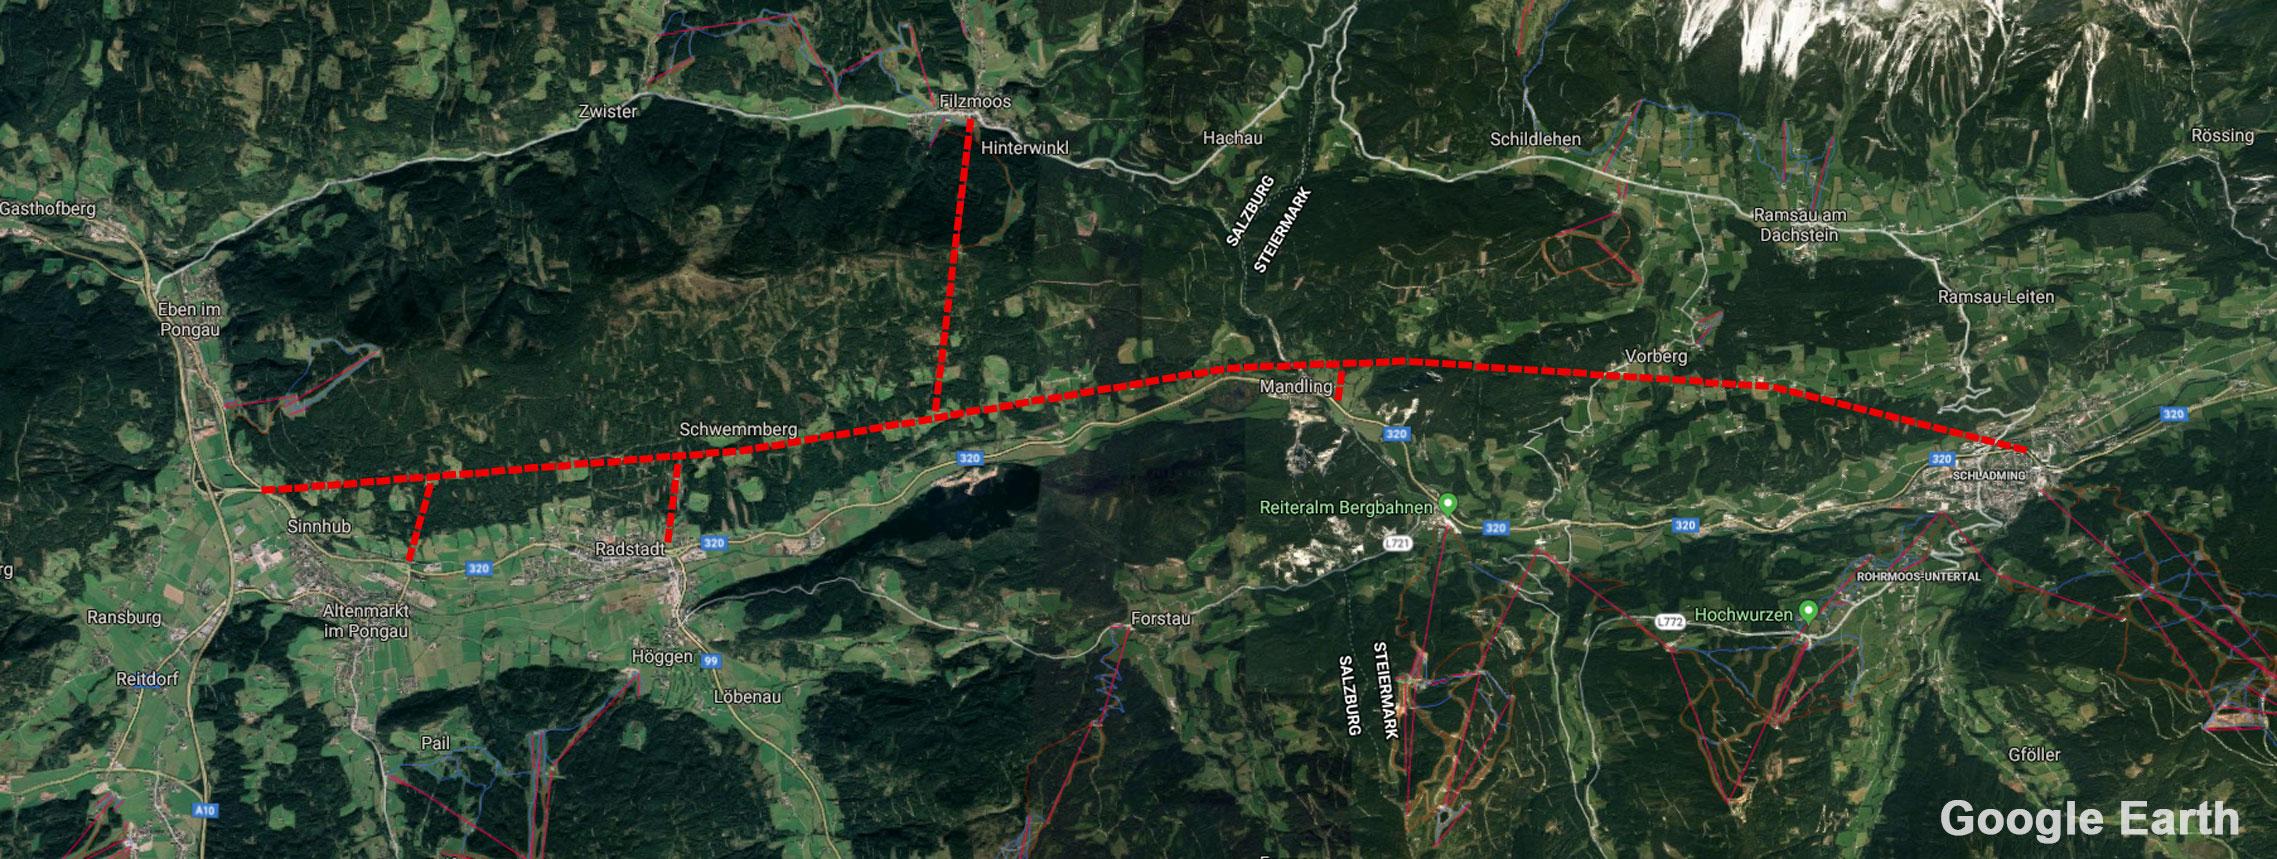 EU-Prestige-Projekt im Ennspongau: Mega-Tunnel im Schwemmberg soll Verkehrslärm und CO2-Ausstoß verringern